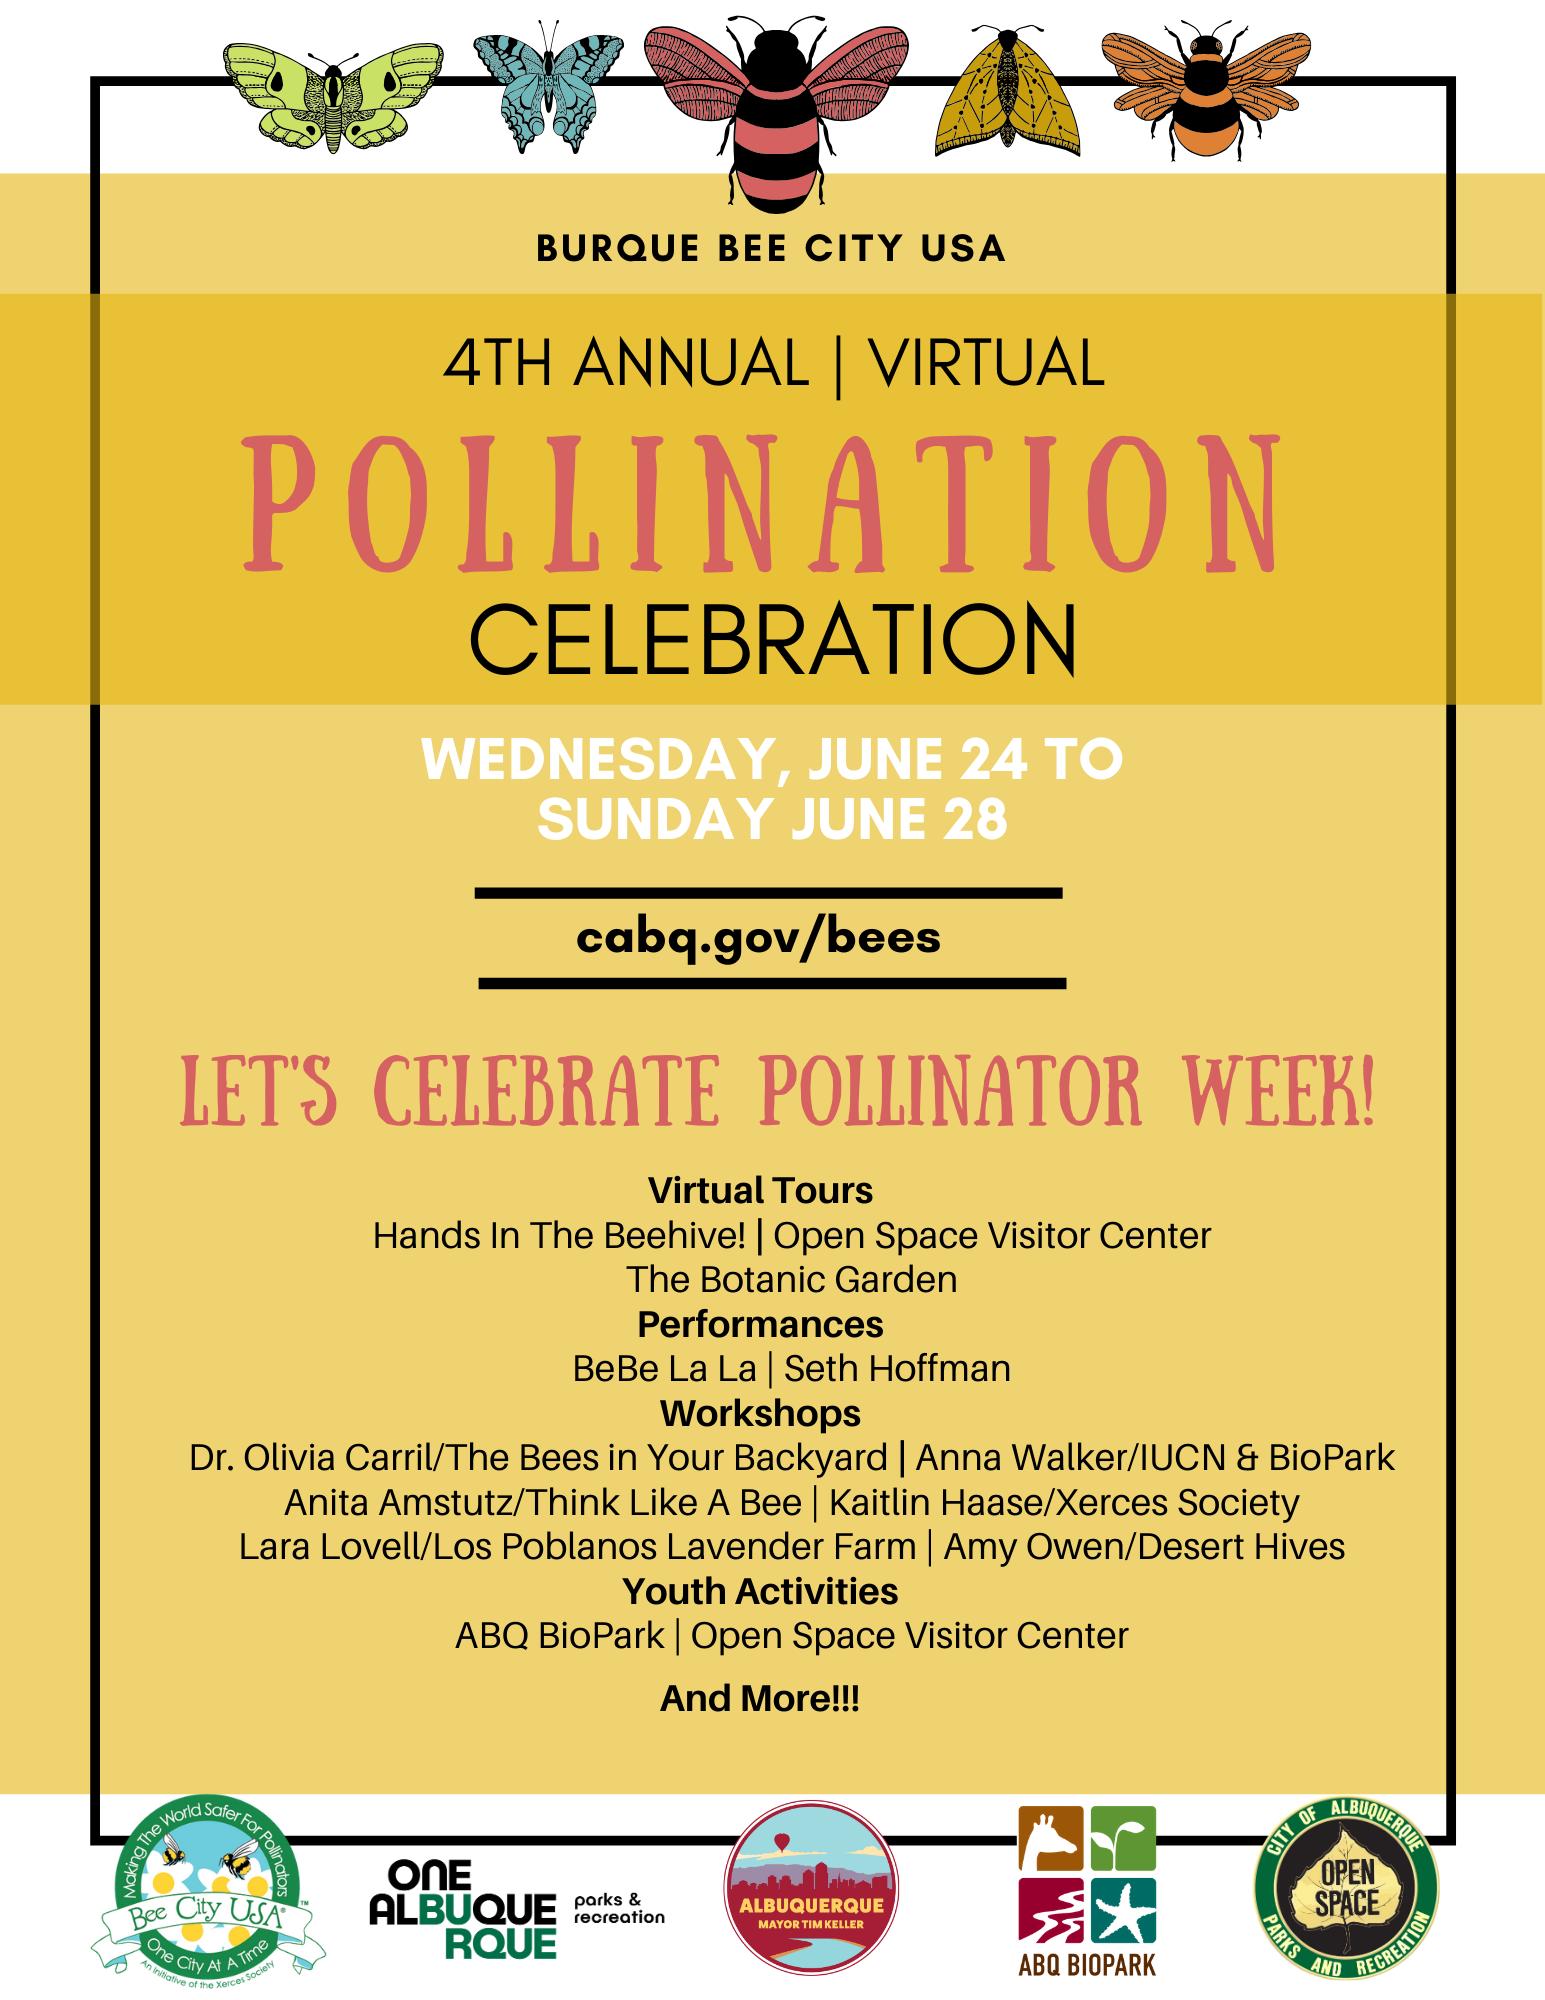 A JPG of Pollinator Celebration: Flyer Image.